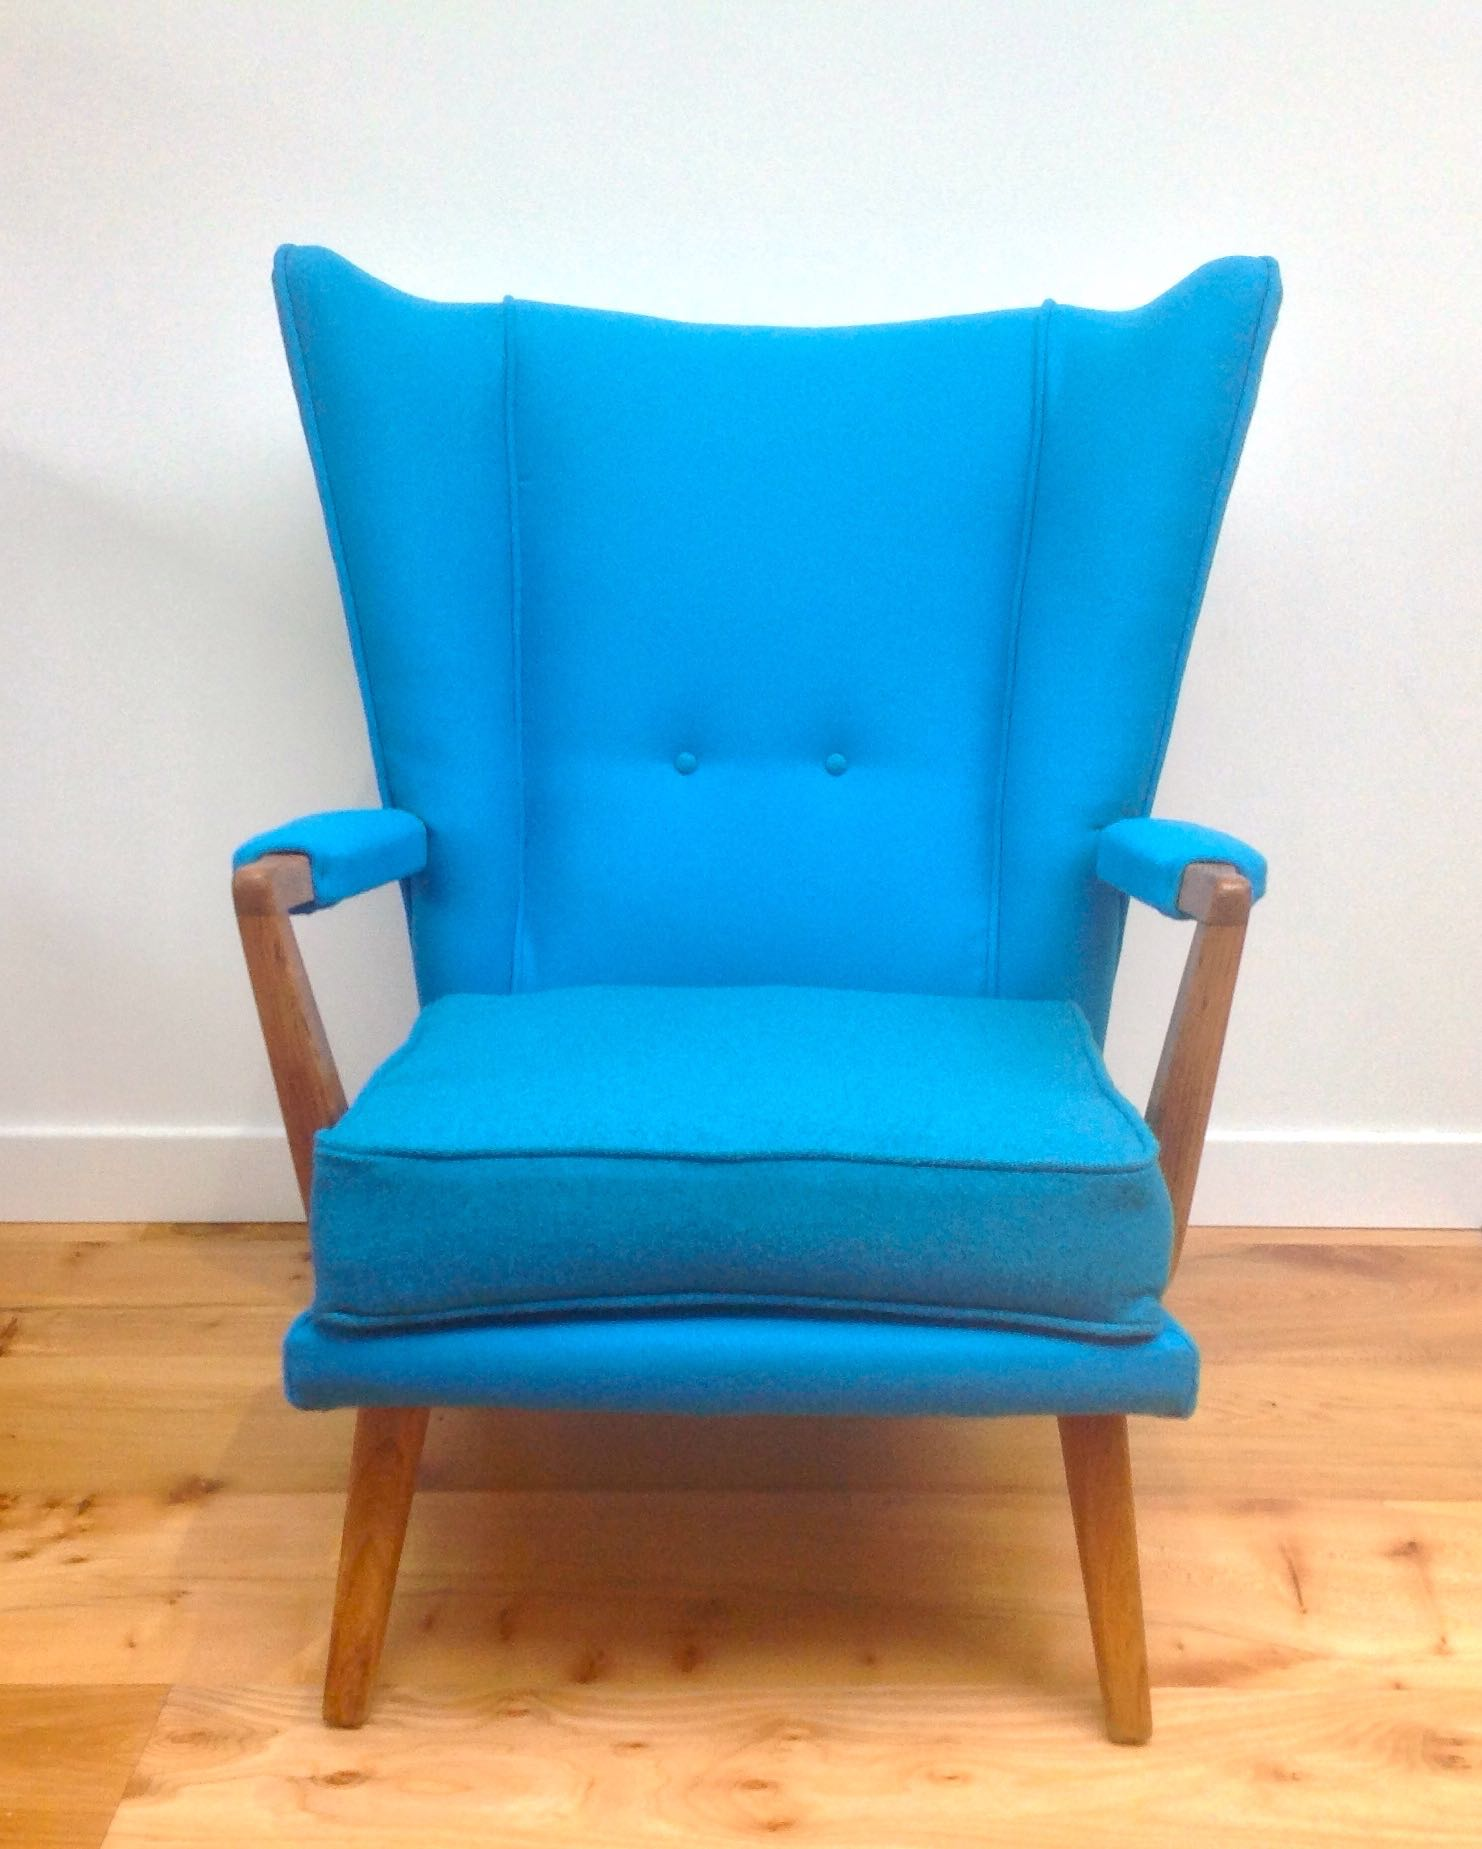 Vintage 1950s G-Plan Armchair - Maud ChairsMaud Chairs